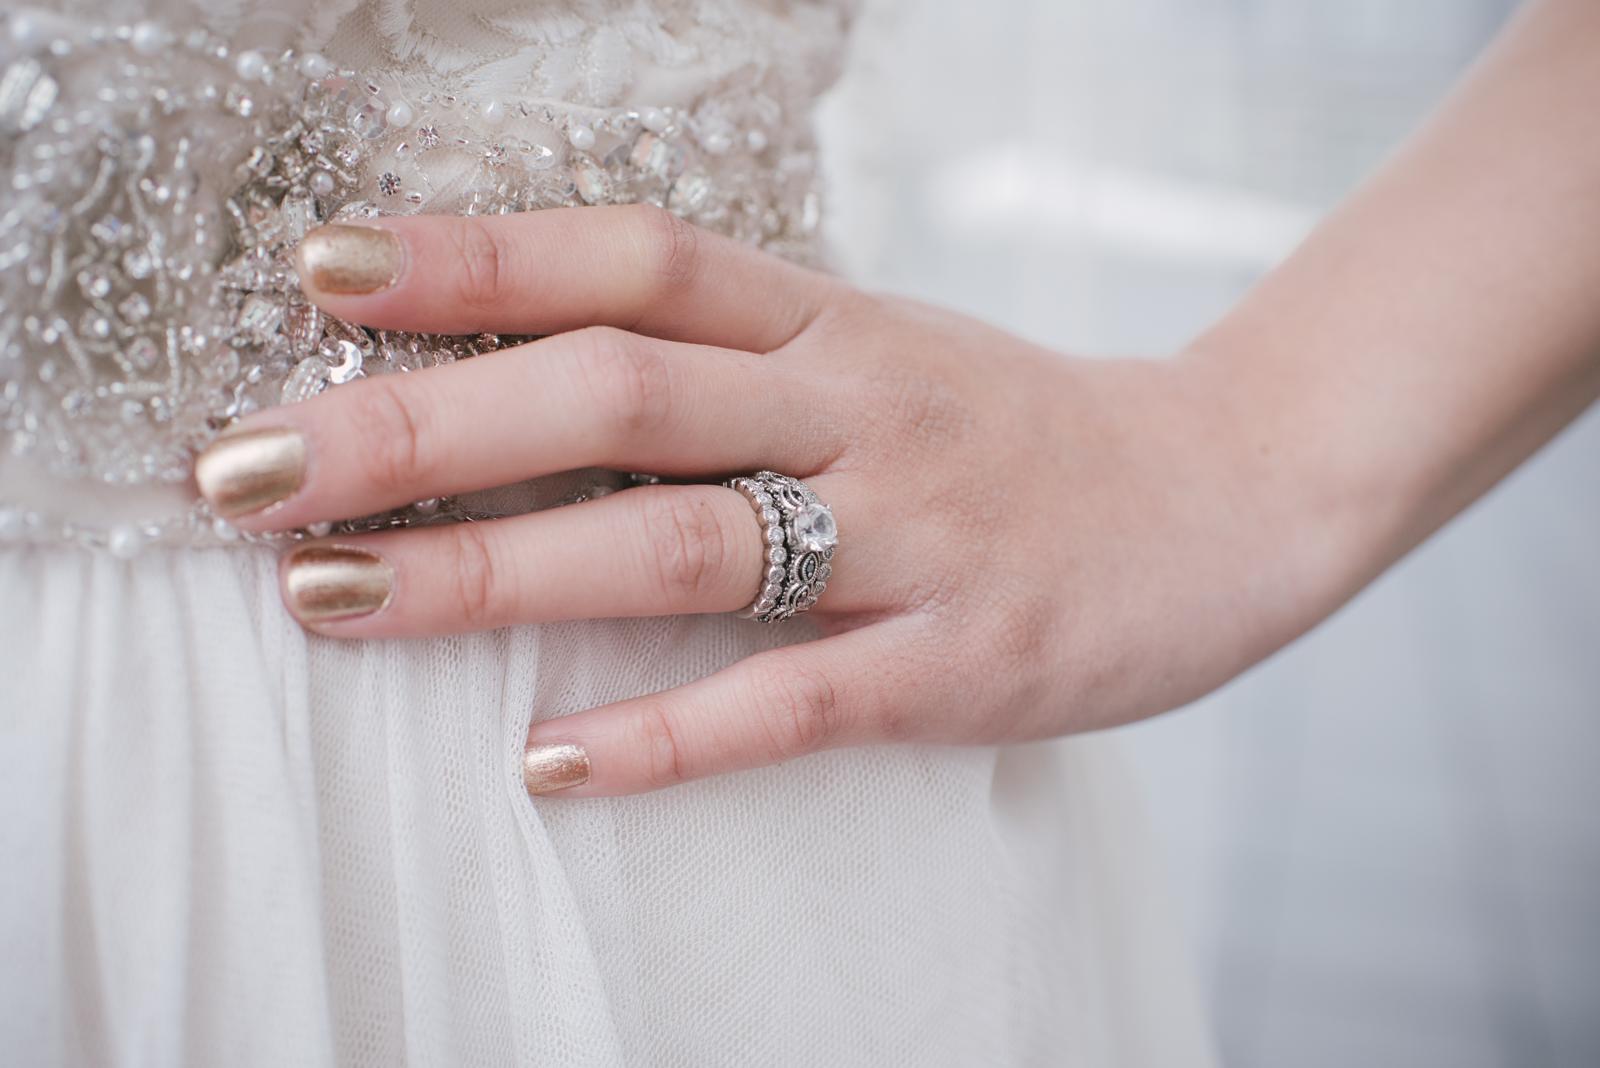 wedding ring wedding dress bridals session. Utah wedding photography ...